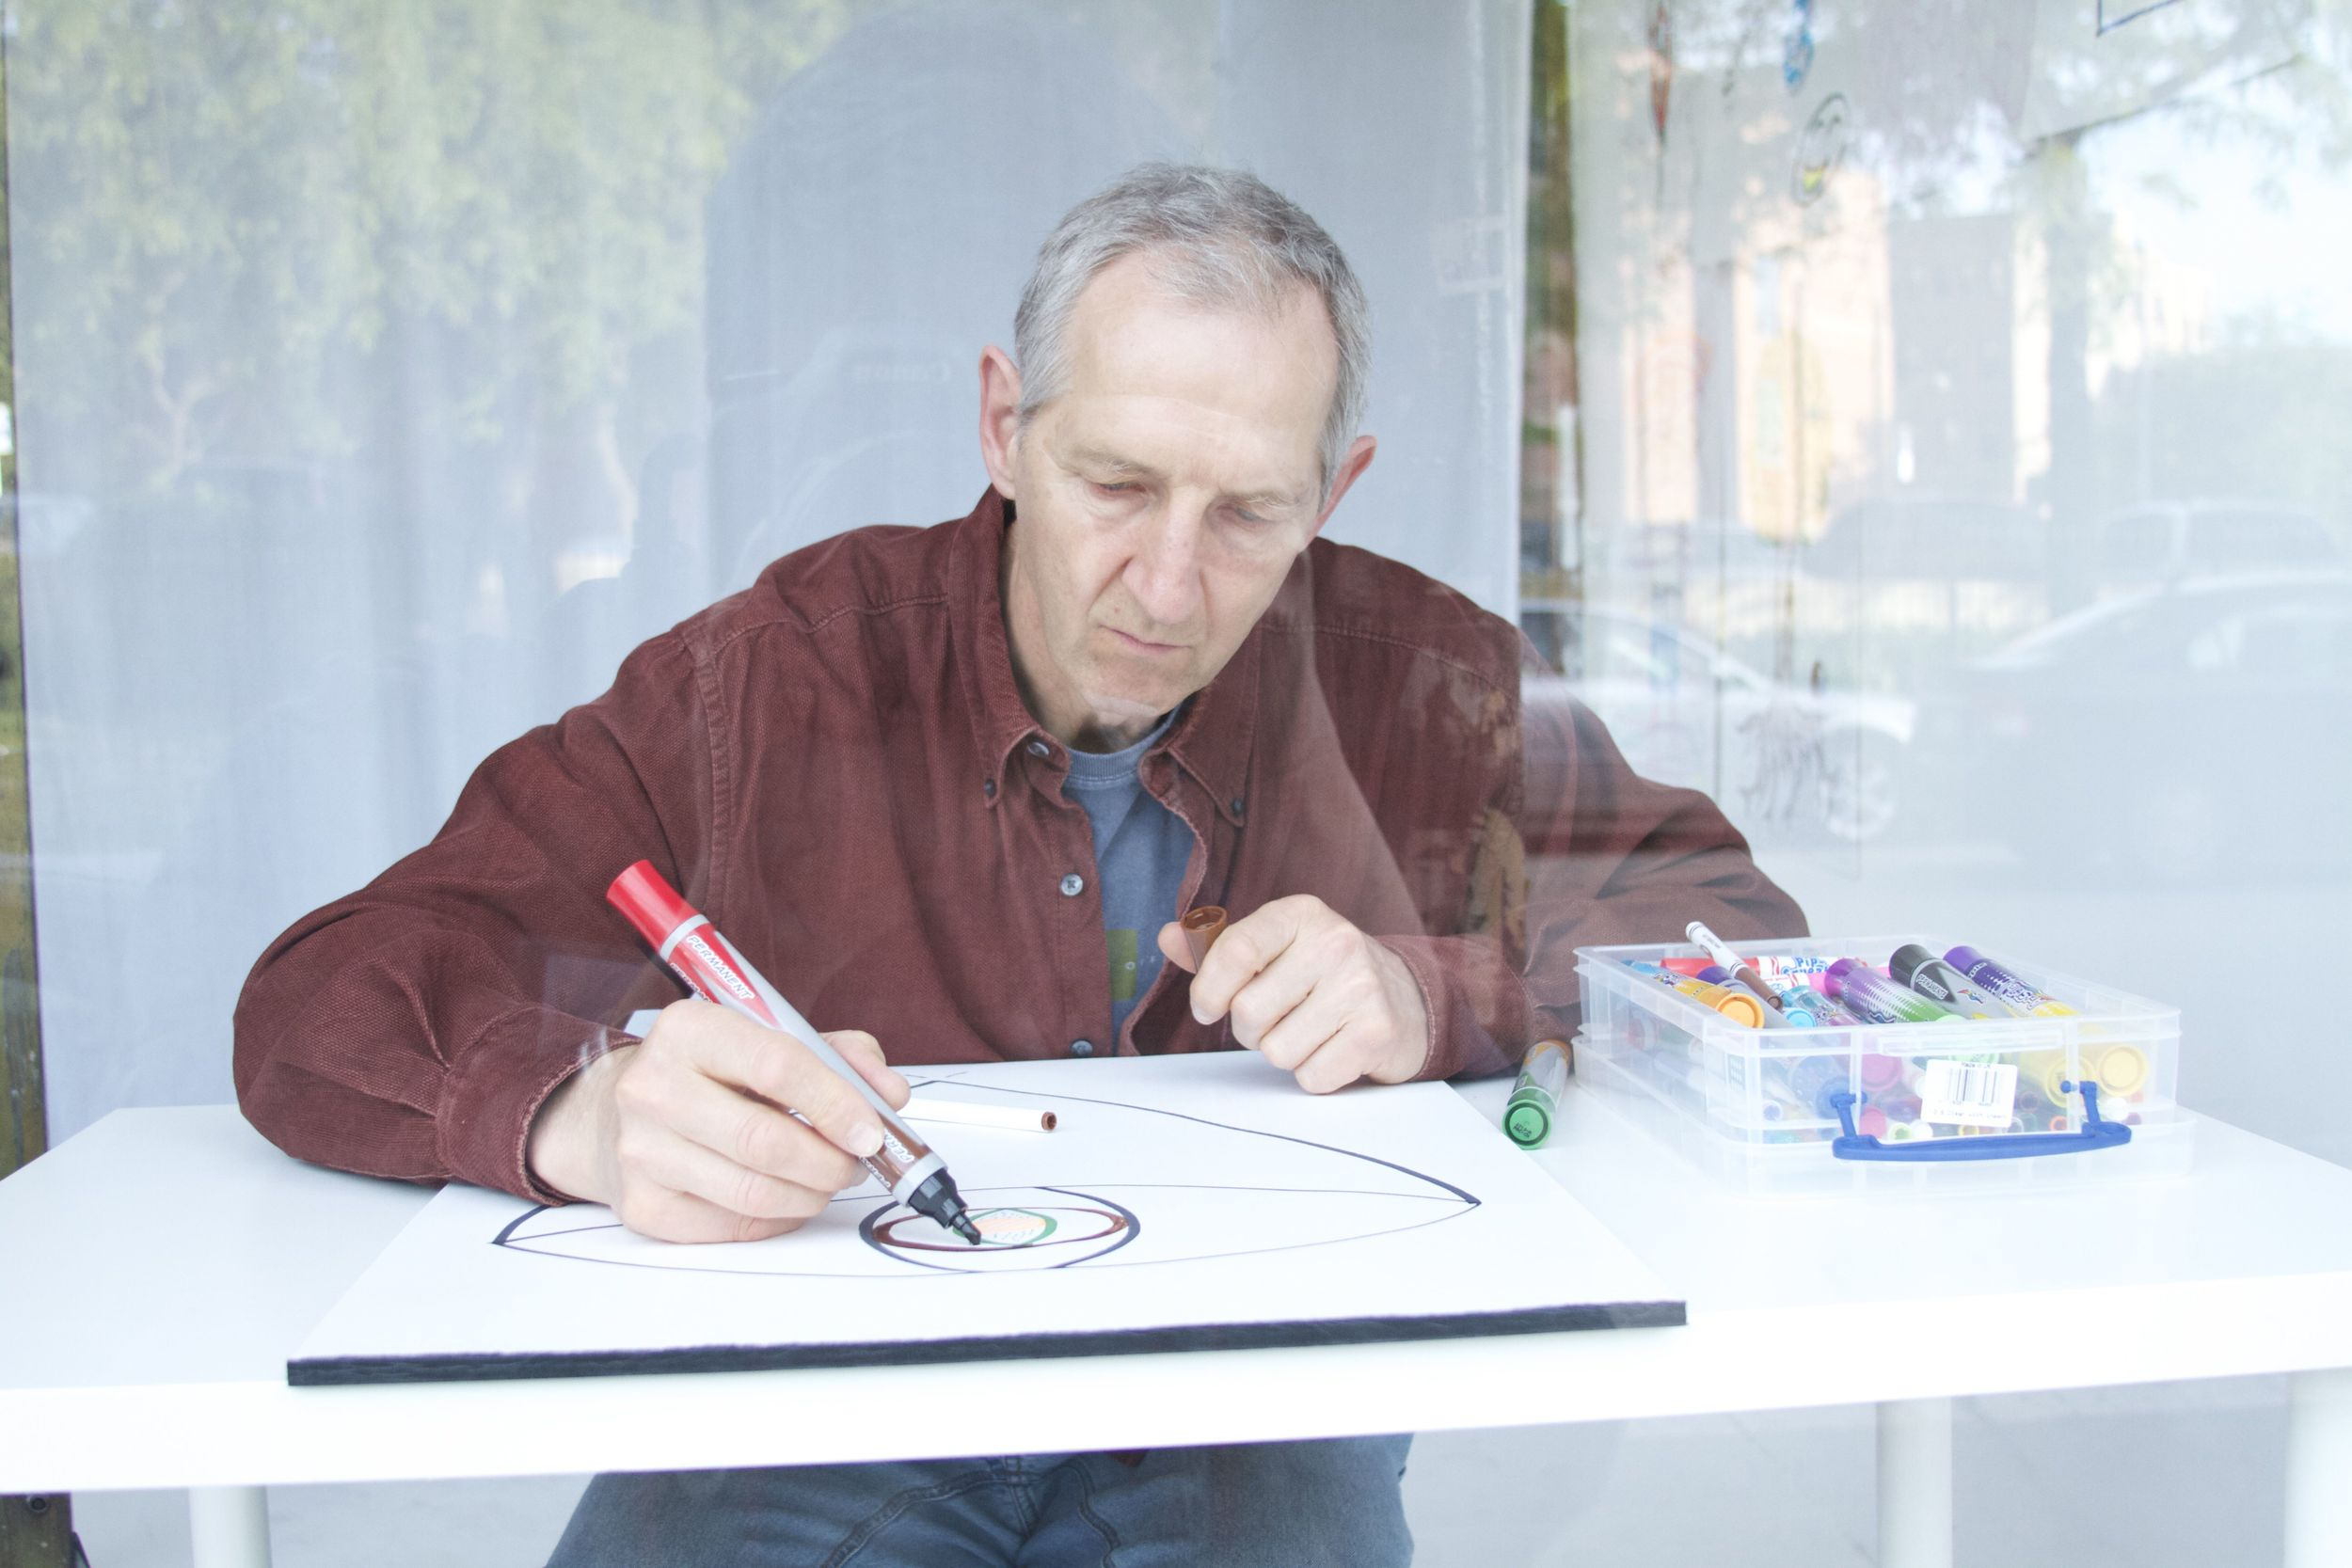 Bryan-drawing.jpg